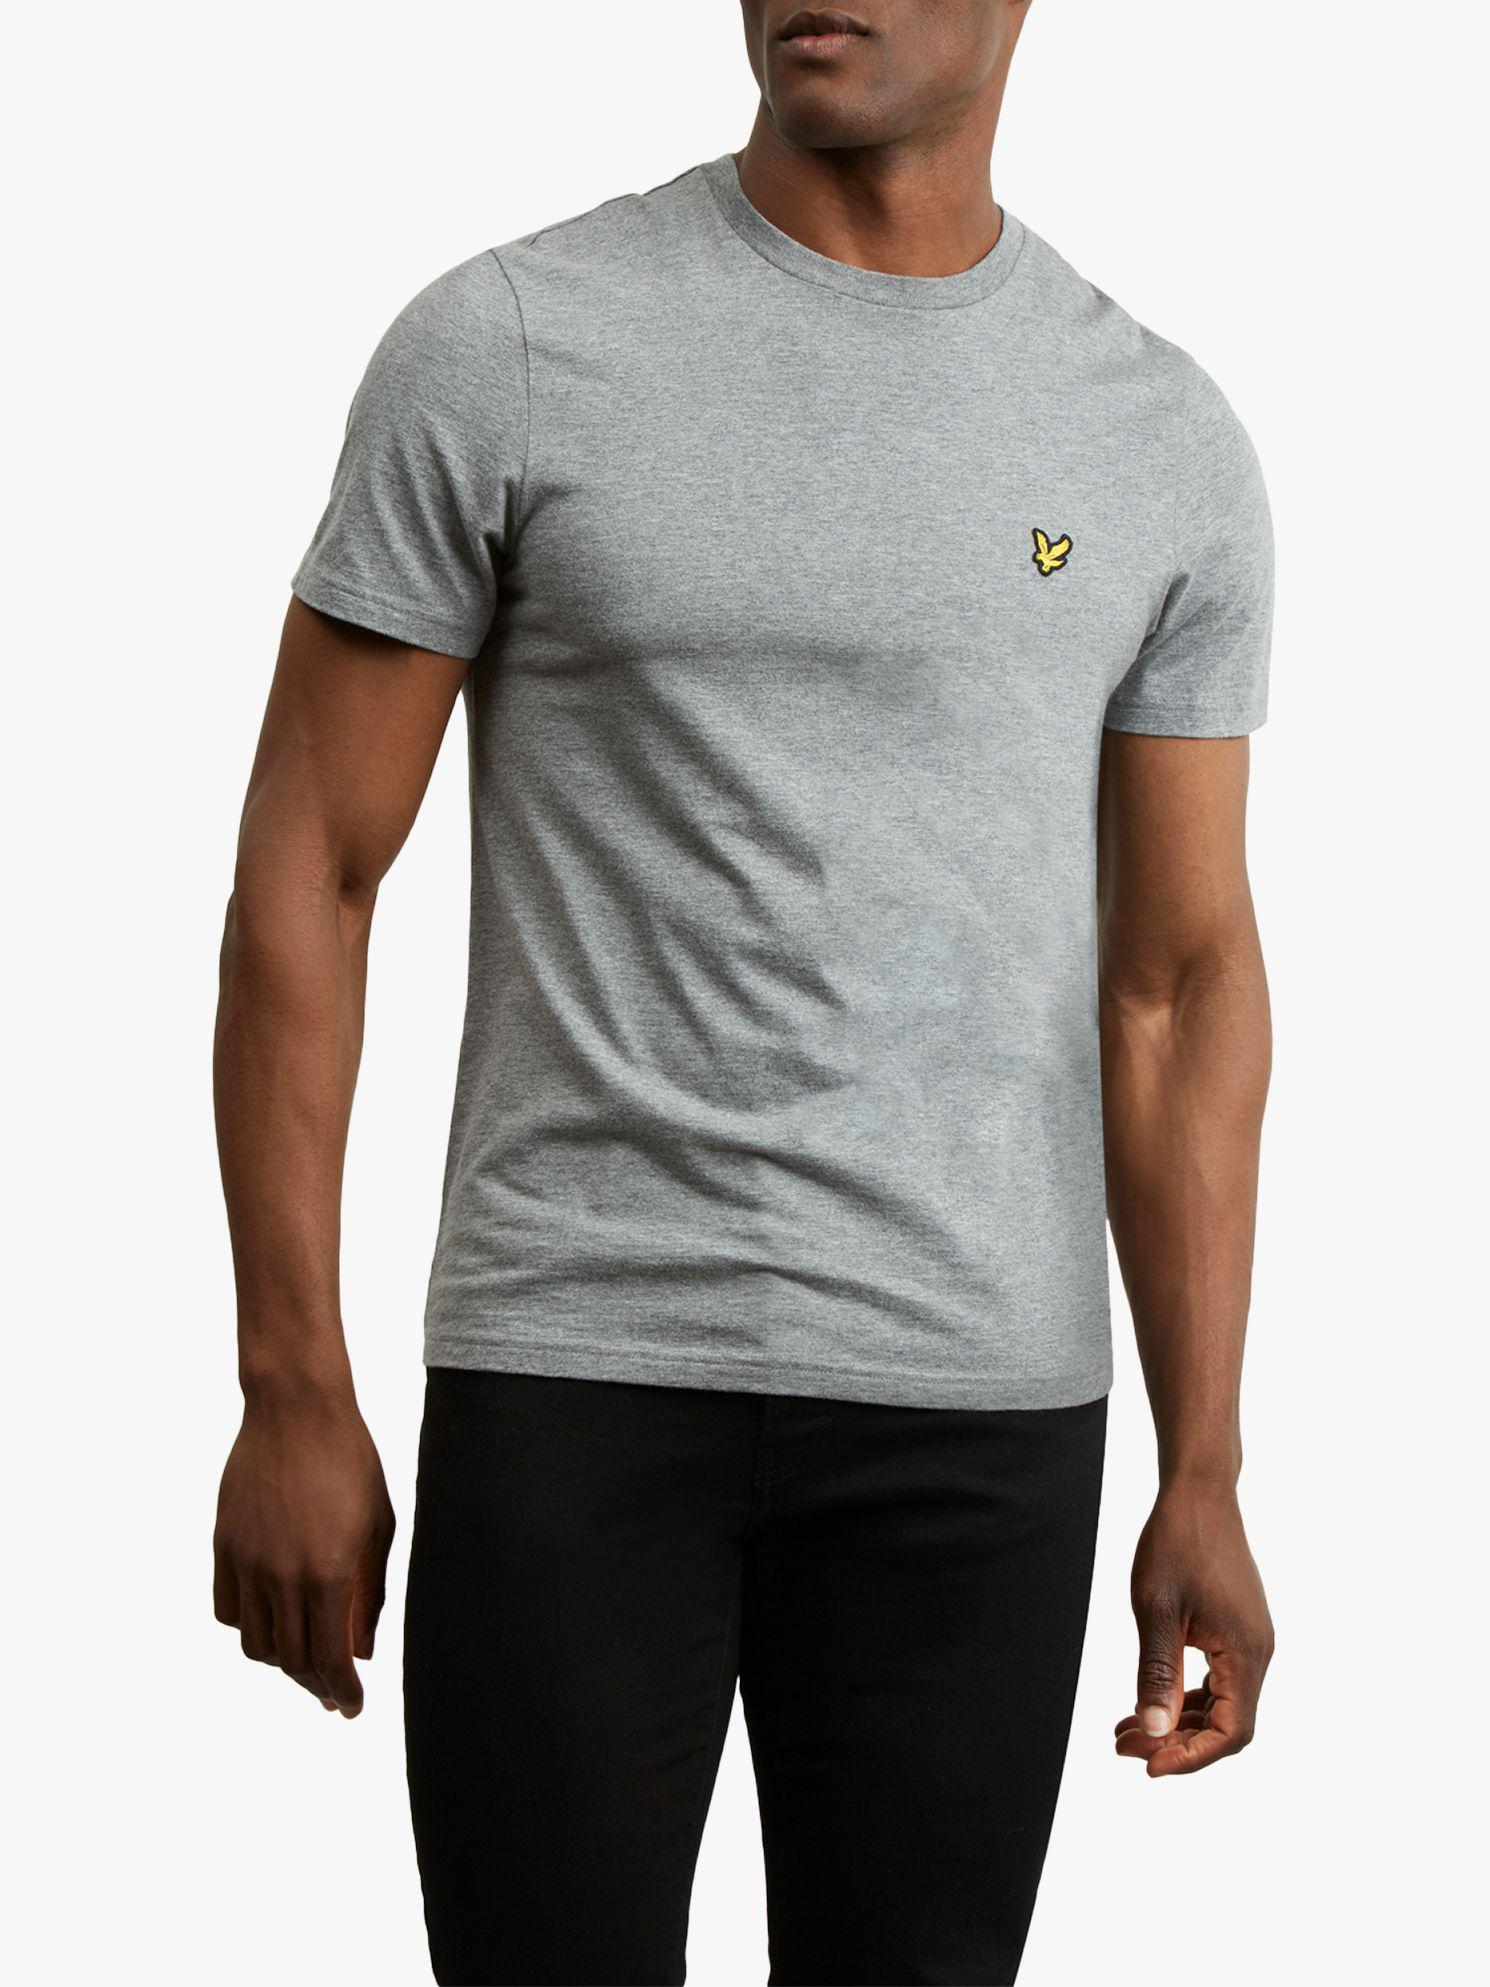 15c746aa6 Lyle & Scott Plain Crew Neck T-shirt in Gray for Men - Save 20% - Lyst